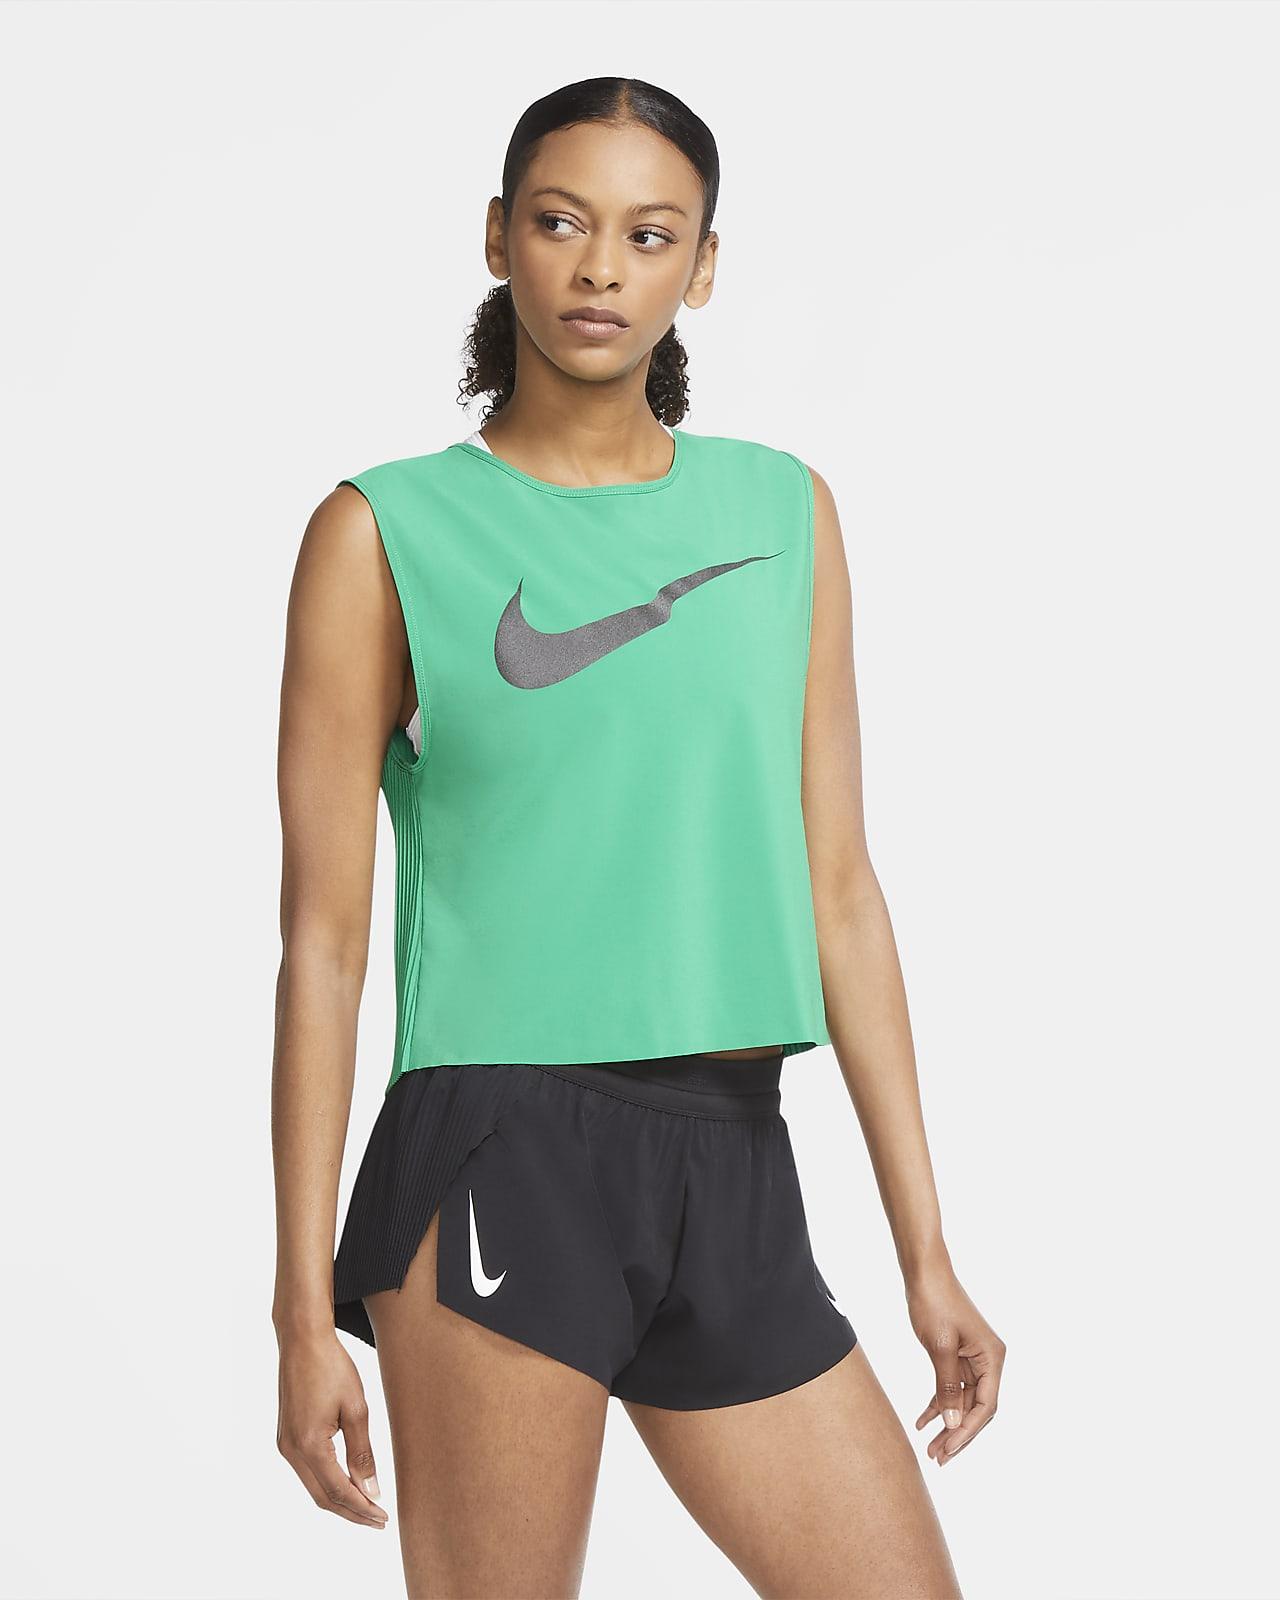 Pleated Running Tank. Nike JP